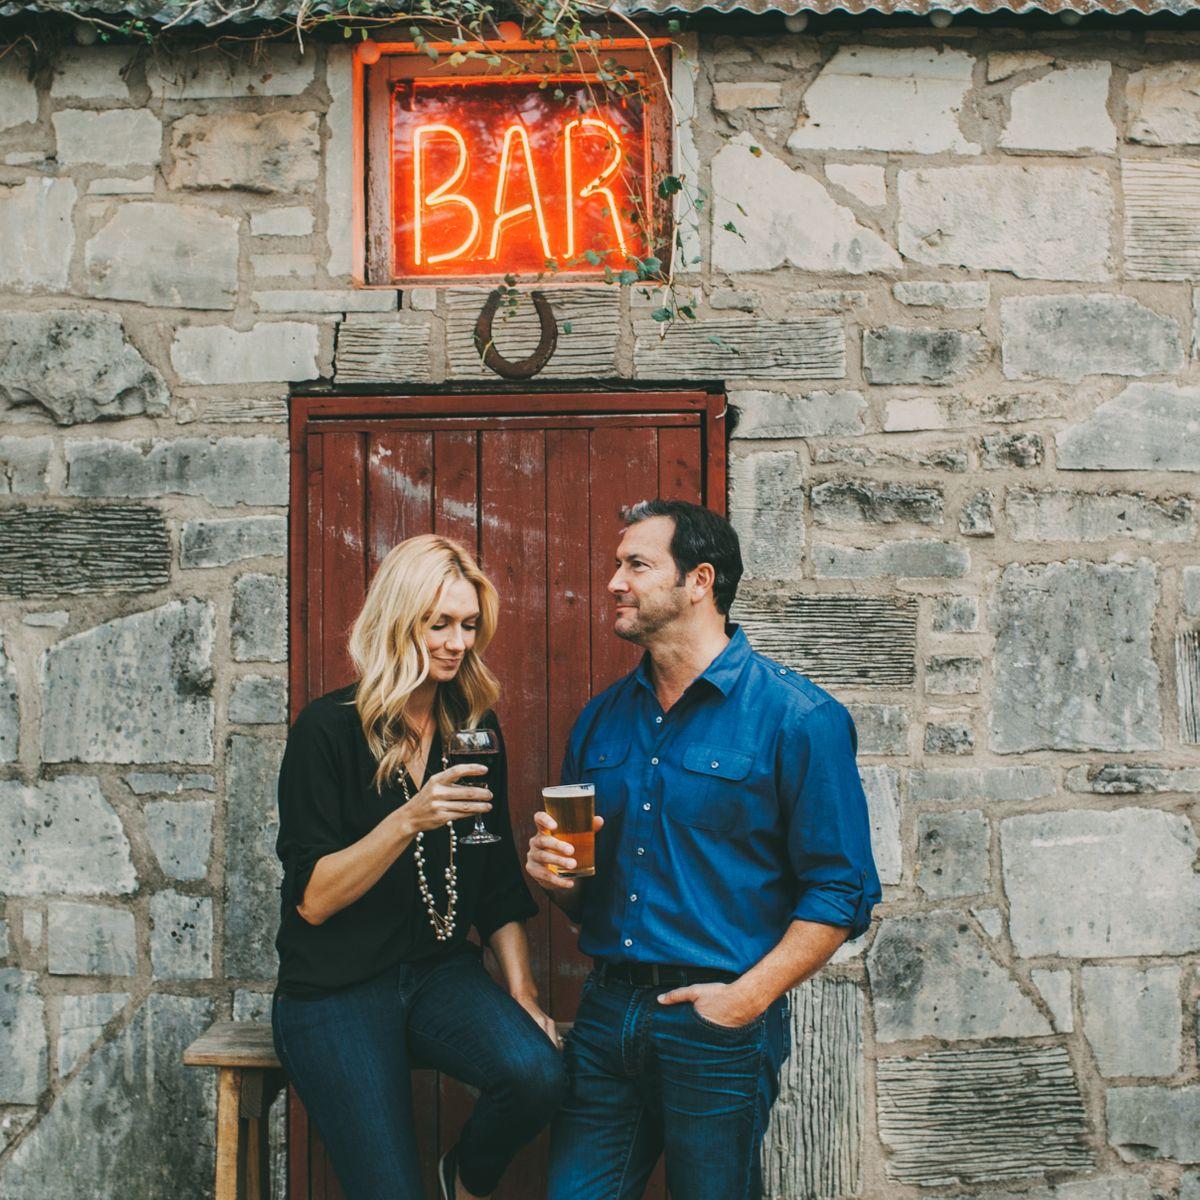 Clive Bar Austin, Texas